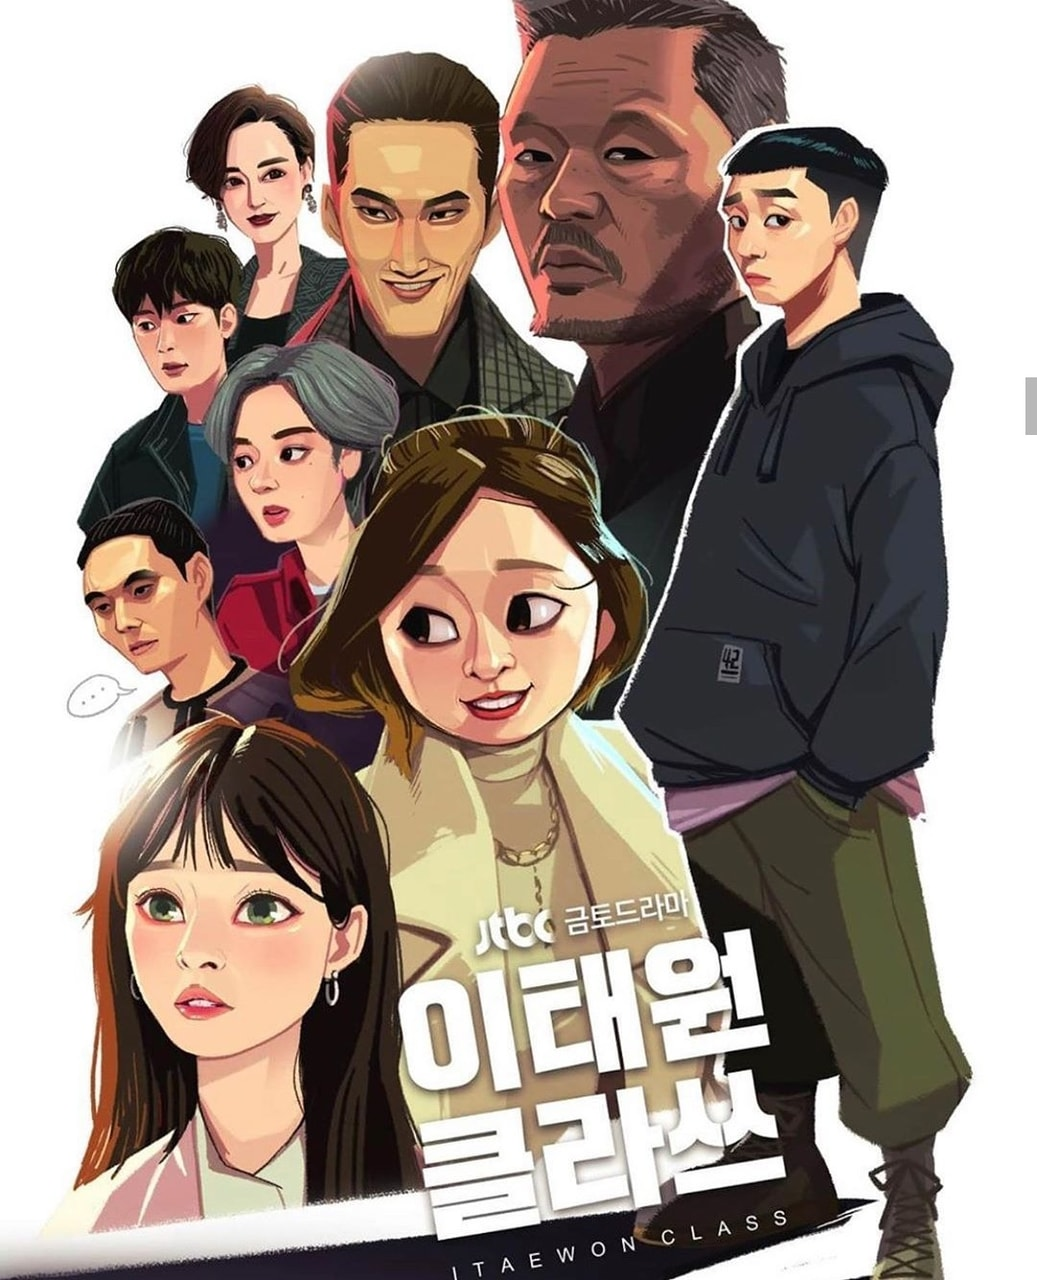 Itaewon Class Webtoon English : itaewon, class, webtoon, english, Itaewon, Class, Discovered, Lucia, Heart